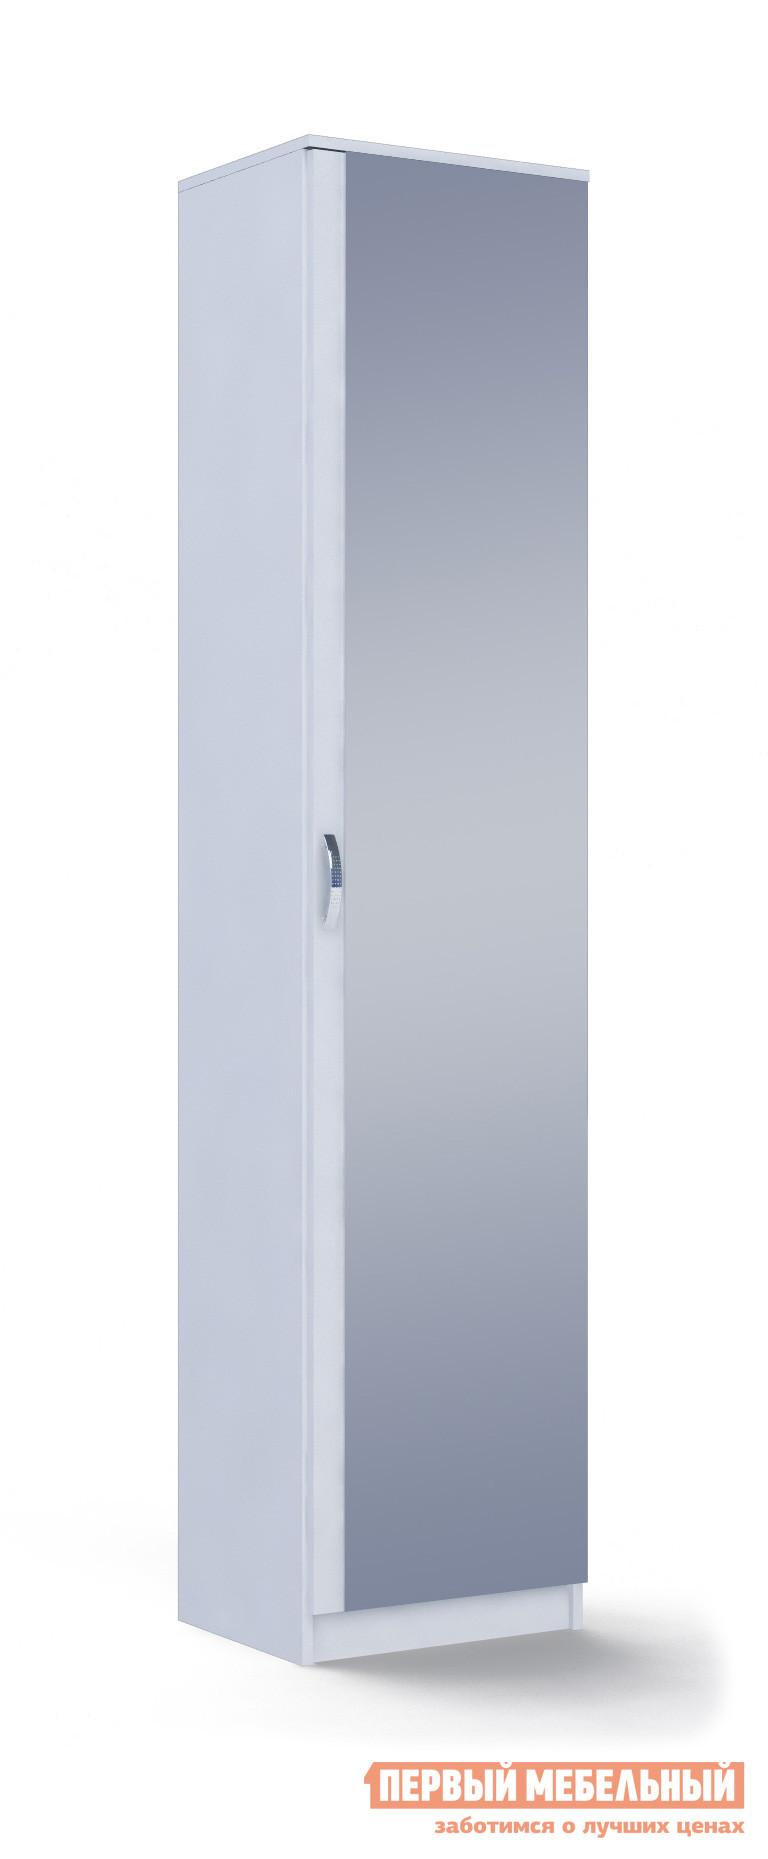 Шкаф распашной МФ Мастер Шкаф 1дверный с зеркалом (Ш1З) Белый